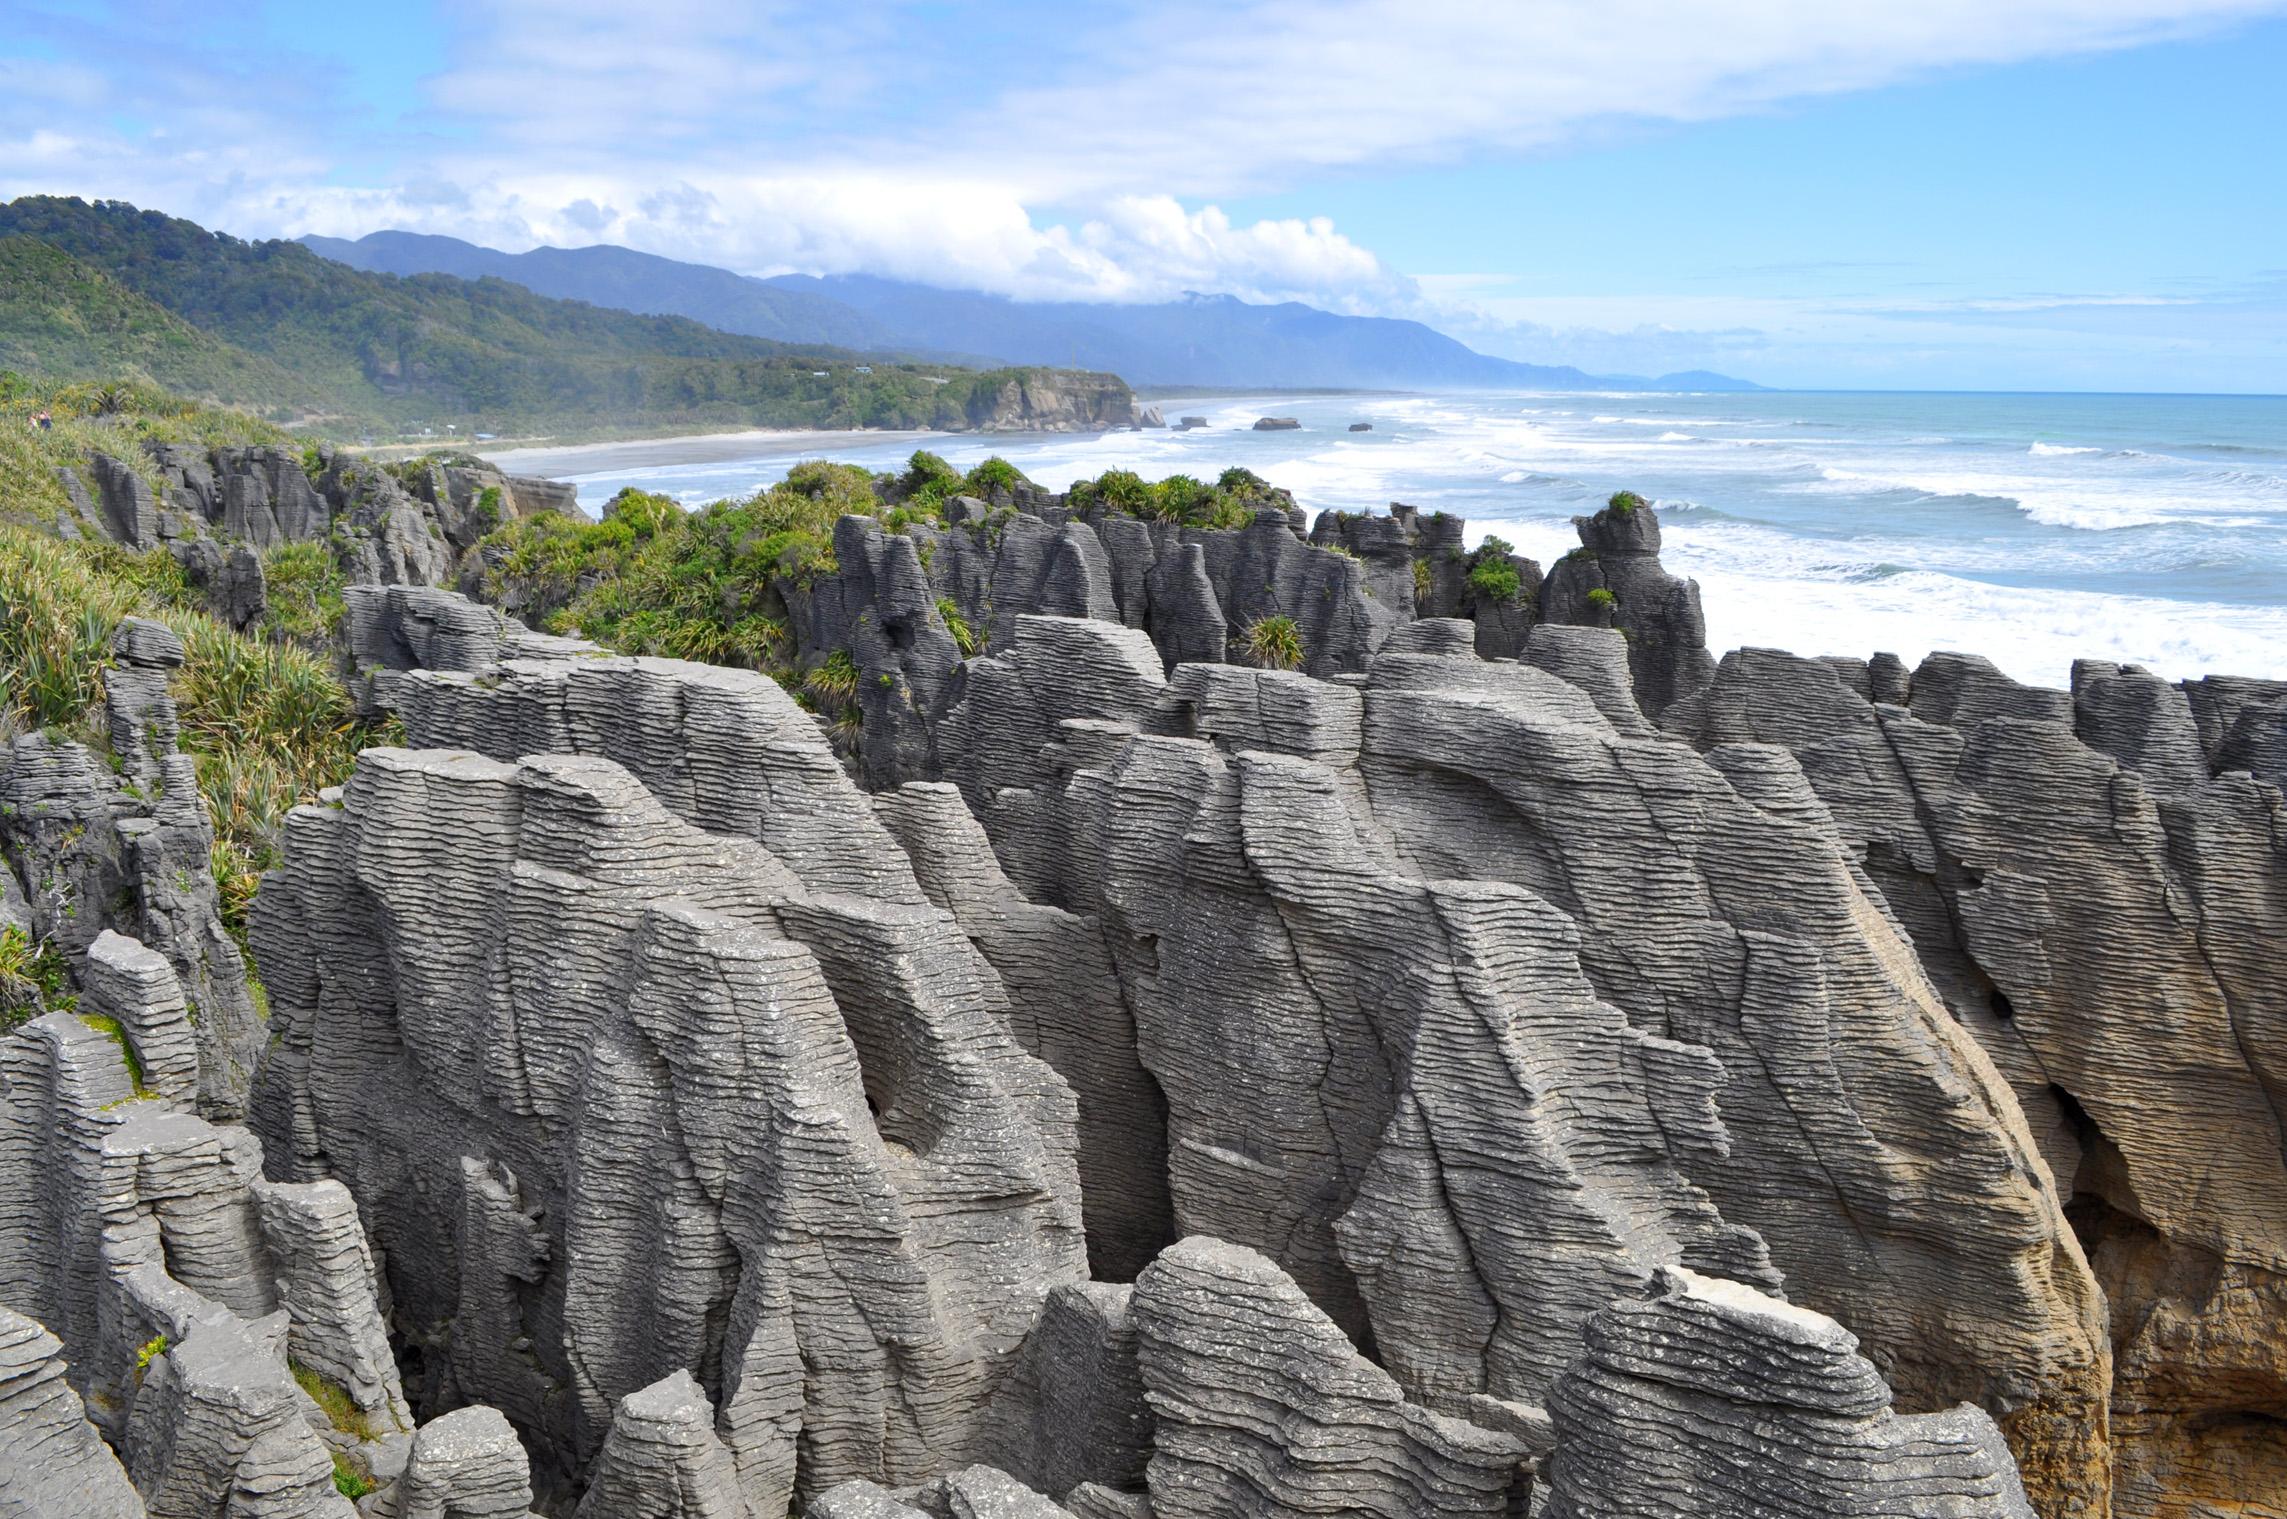 panqueca-rochas-marabilla-do-new-zeland-secret-world